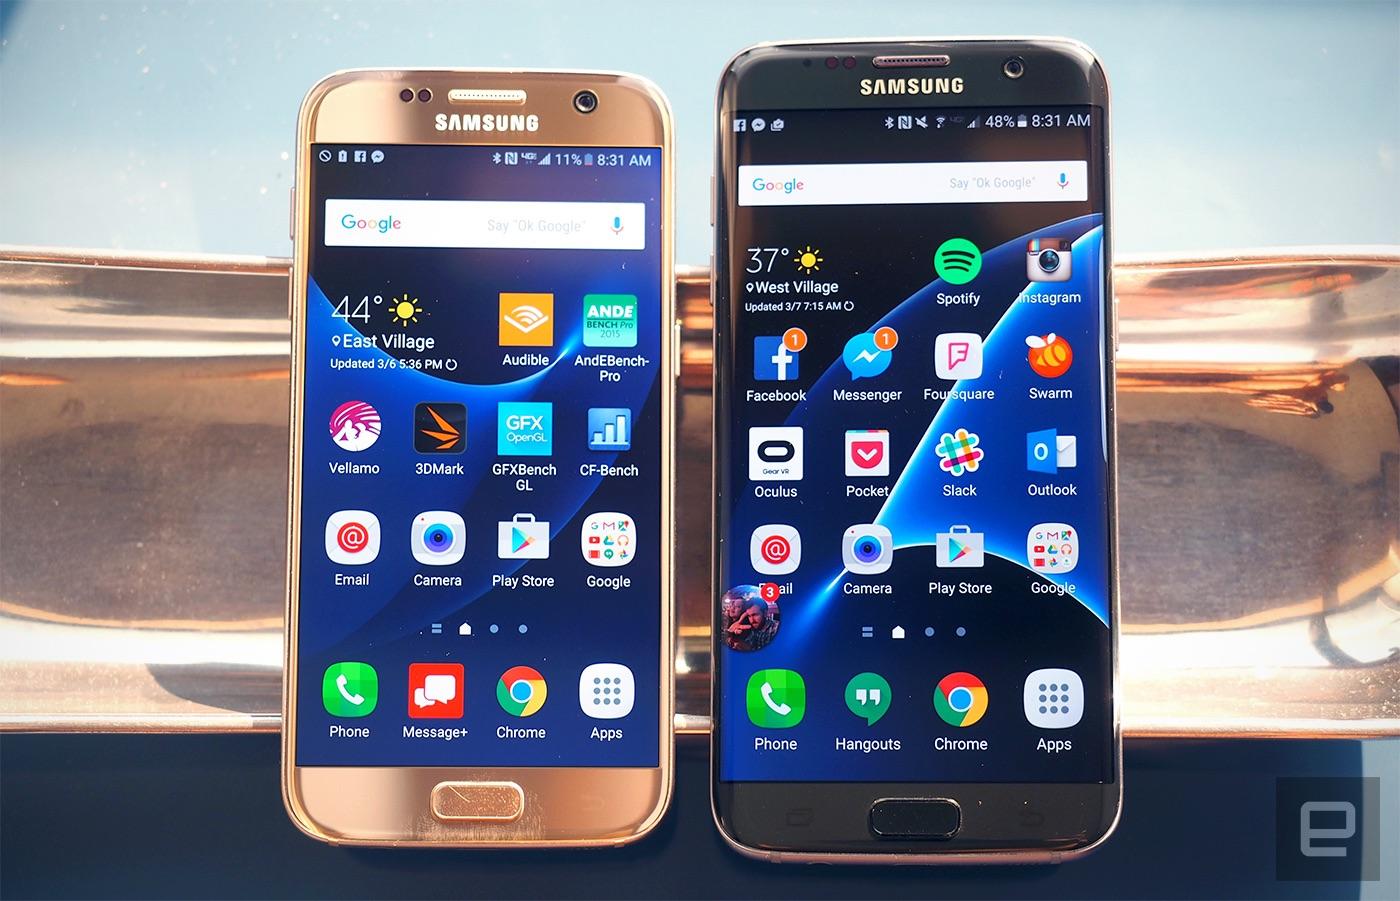 Samsung Galaxy S7 Edge Mini